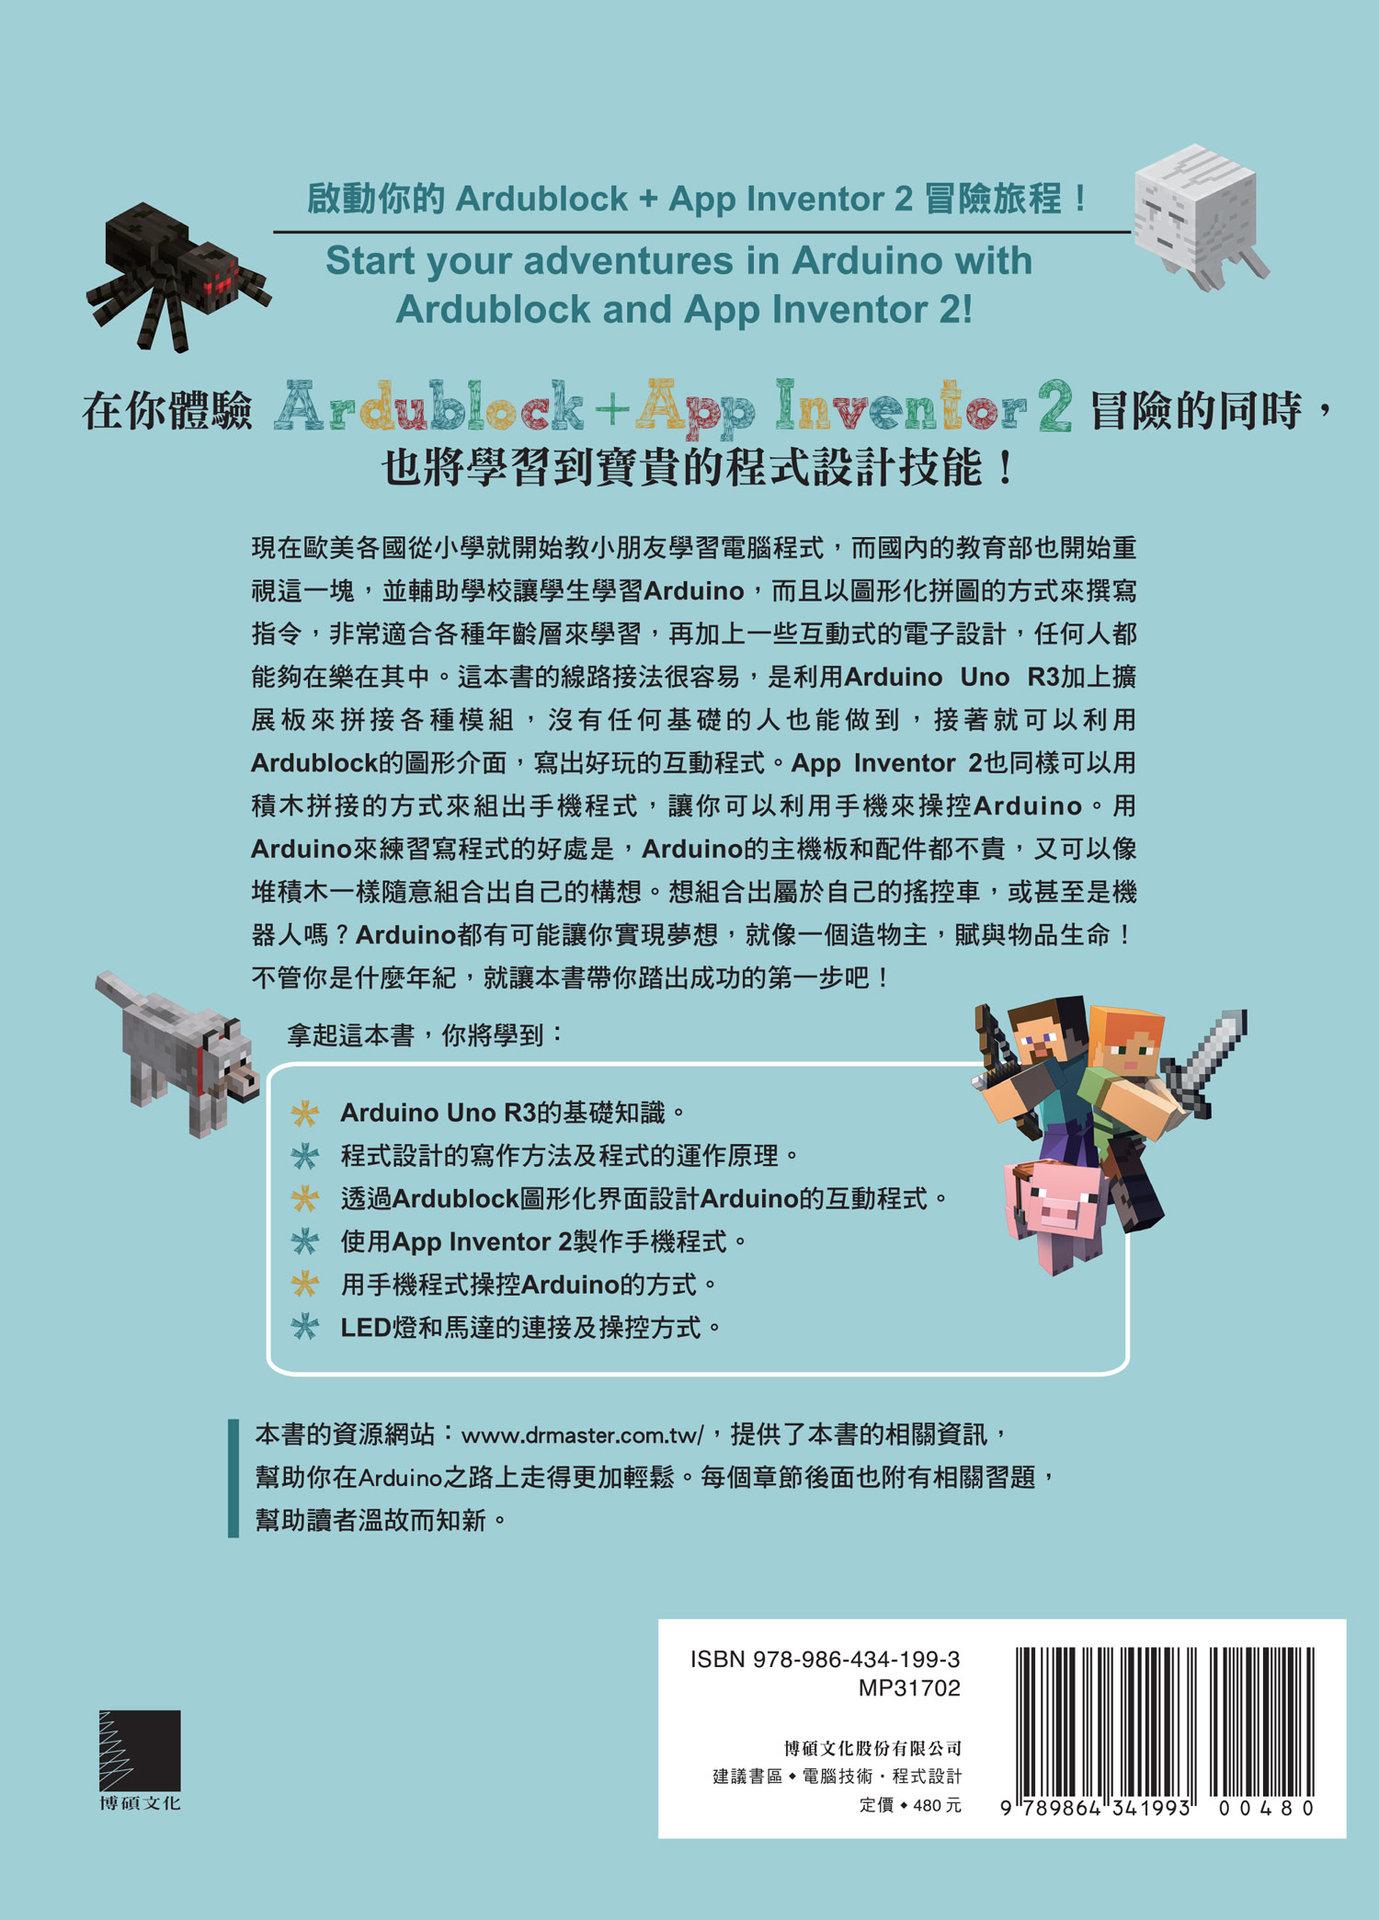 Ardublock + App Inventor 2 輕鬆學:玩積木寫程式,輕鬆進入 Arduino 的創意世界-preview-14